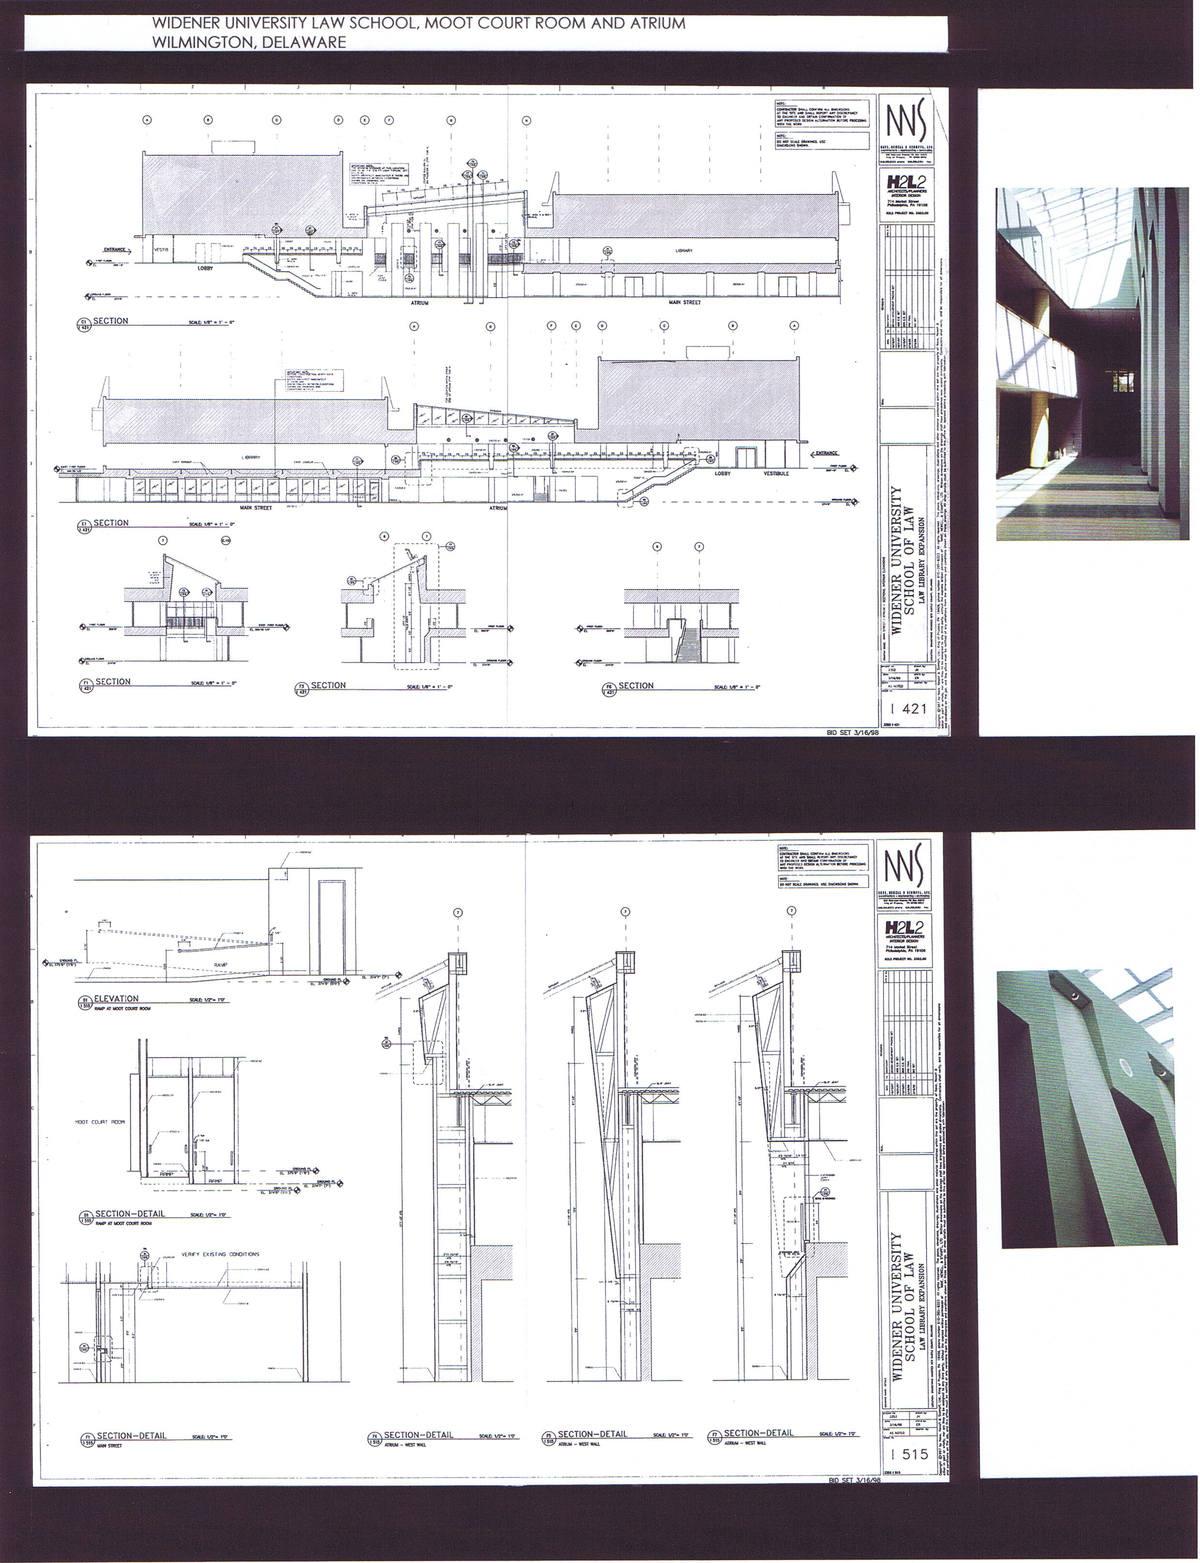 Atrium Elevations and Details